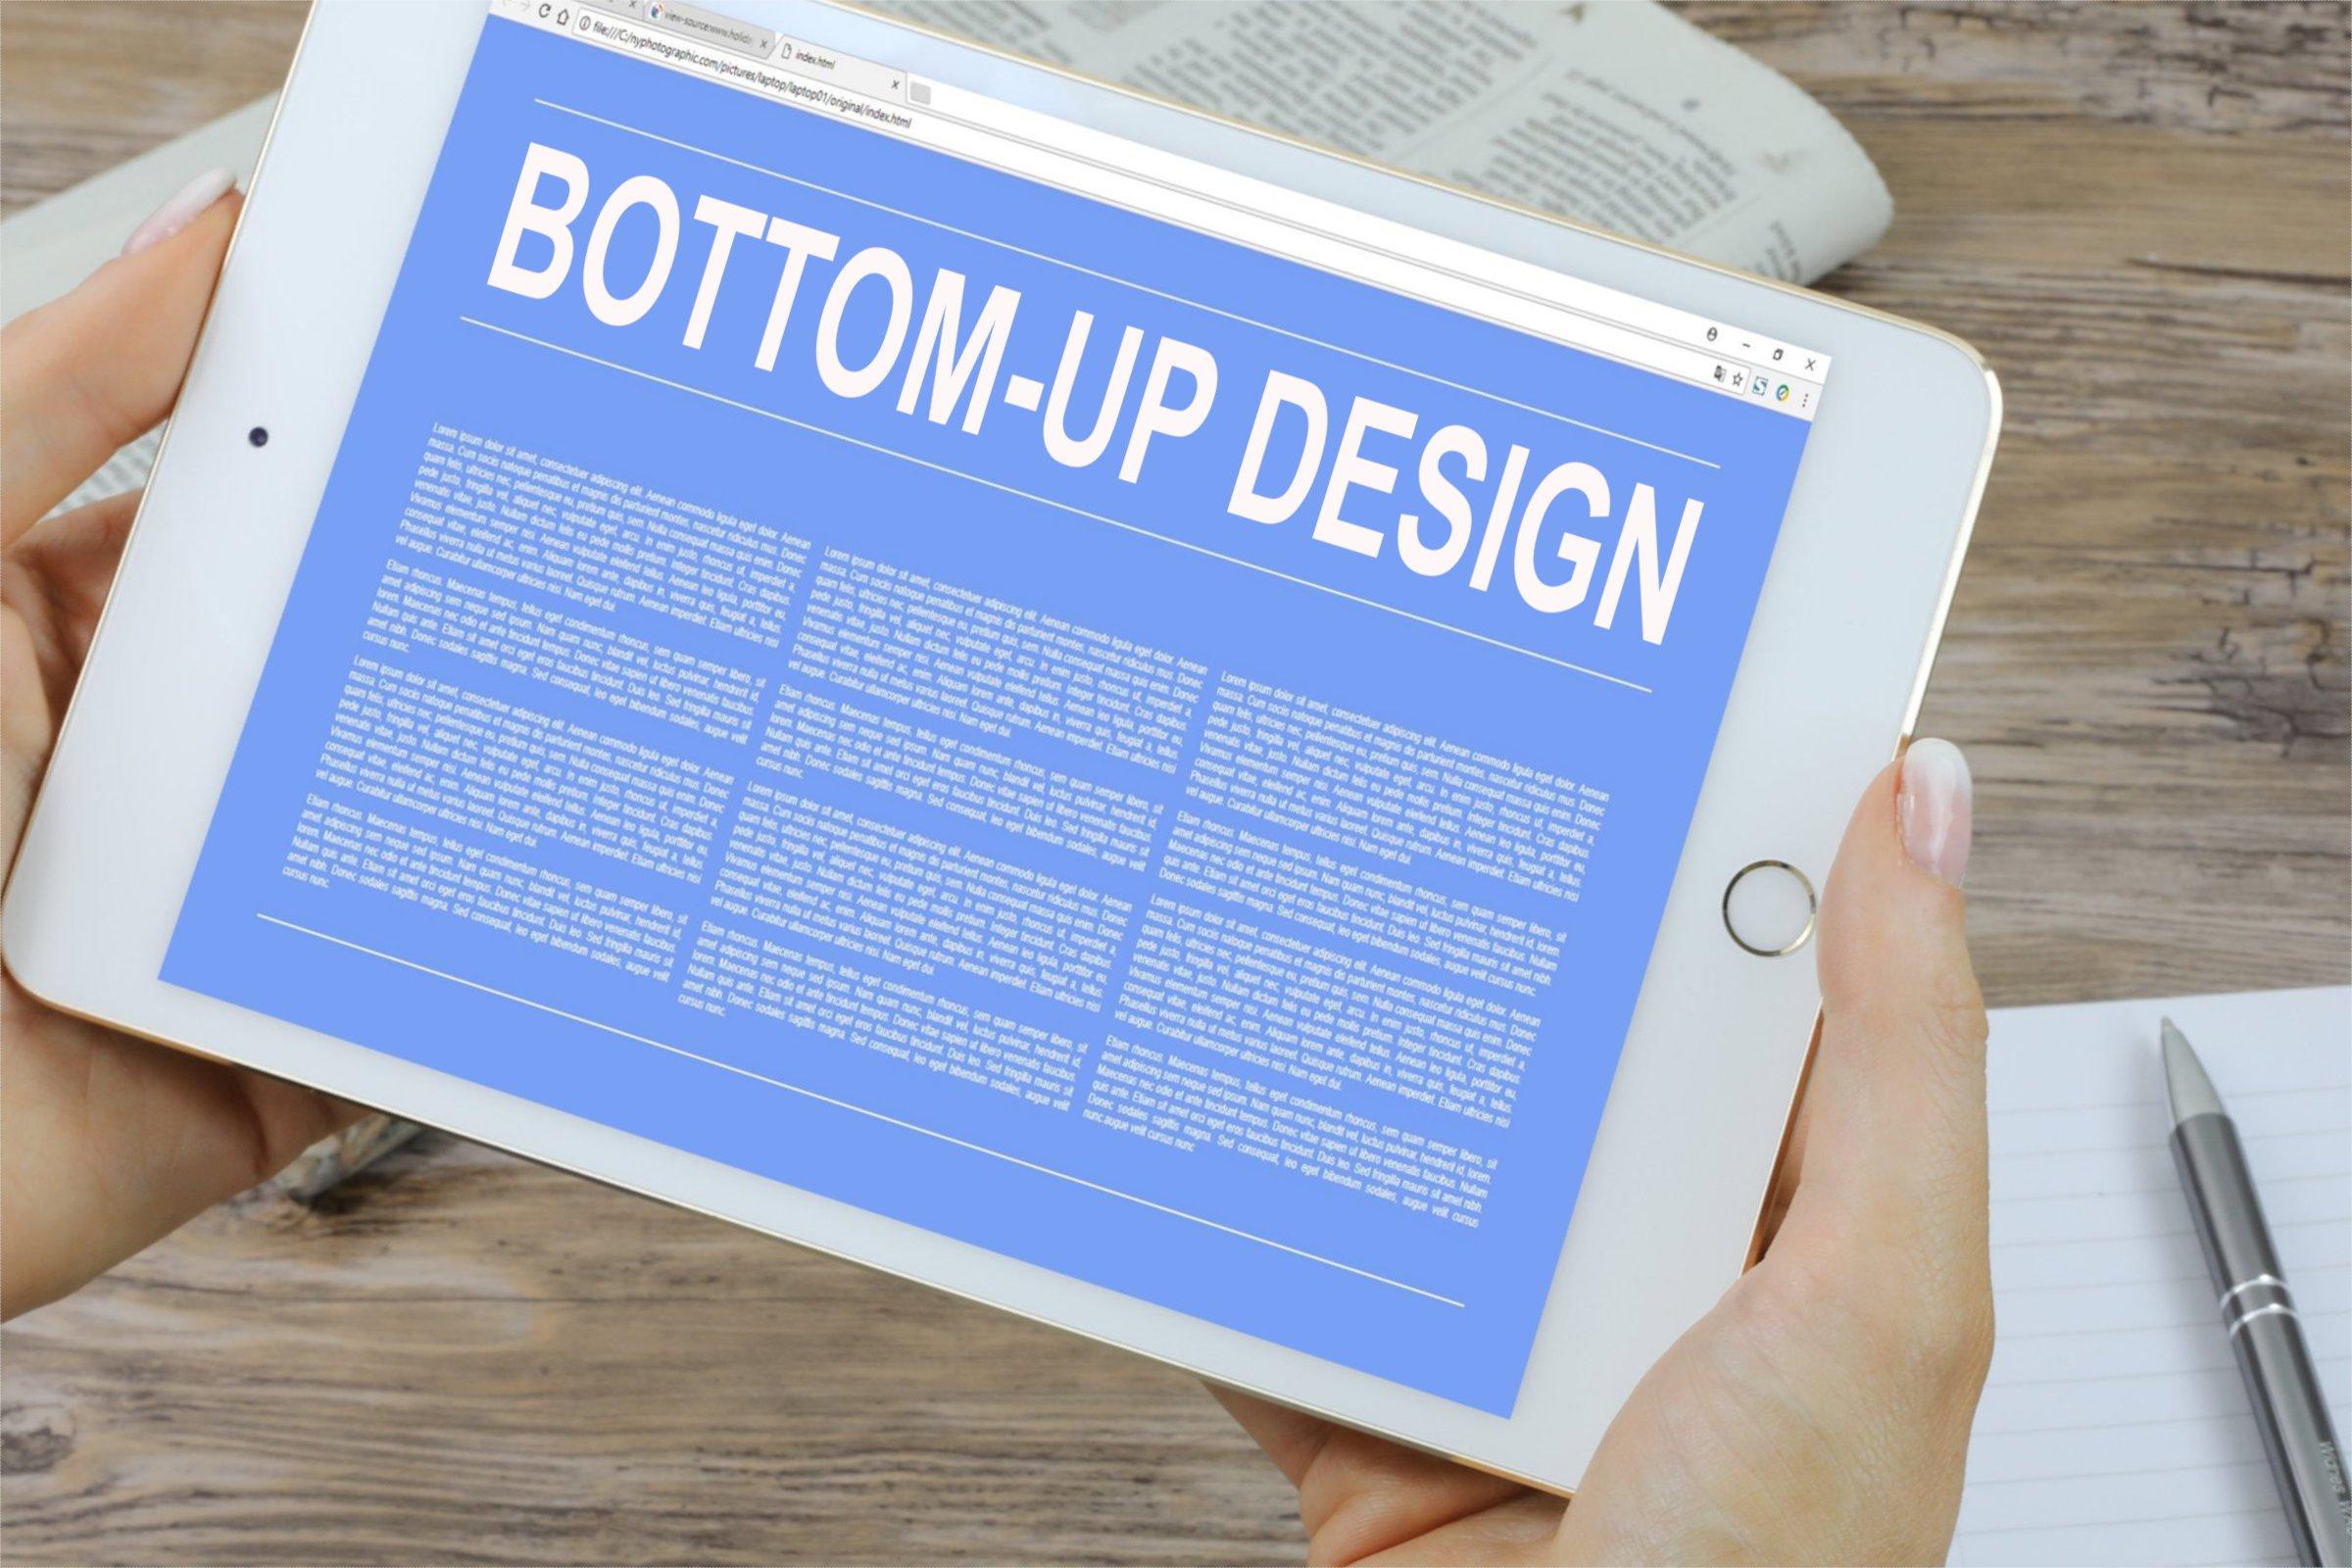 Bottom Up Design